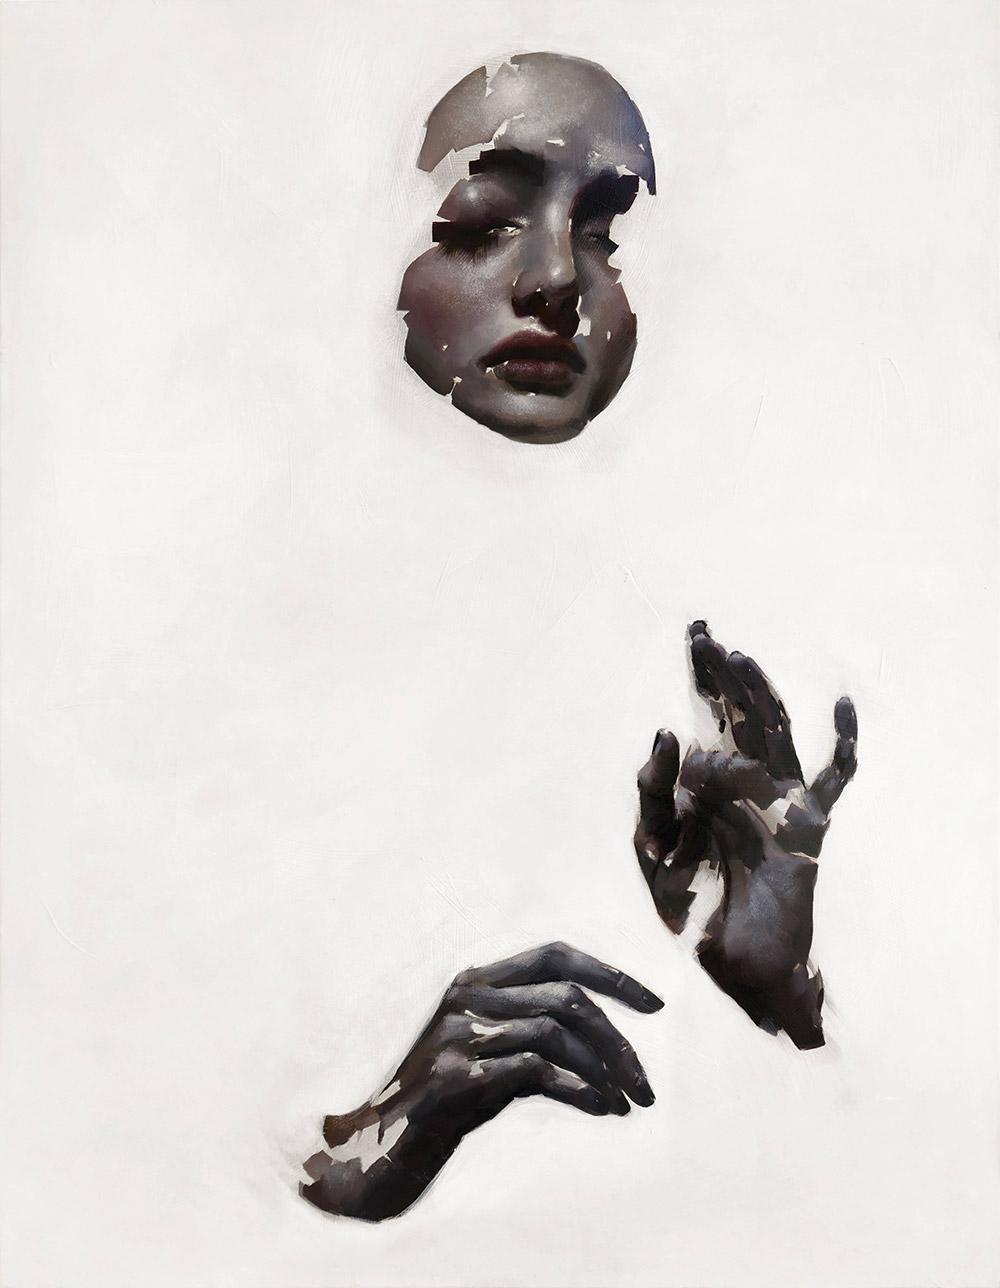 Yulia-Bas-Visual-Atelier-8-Art-4.jpg